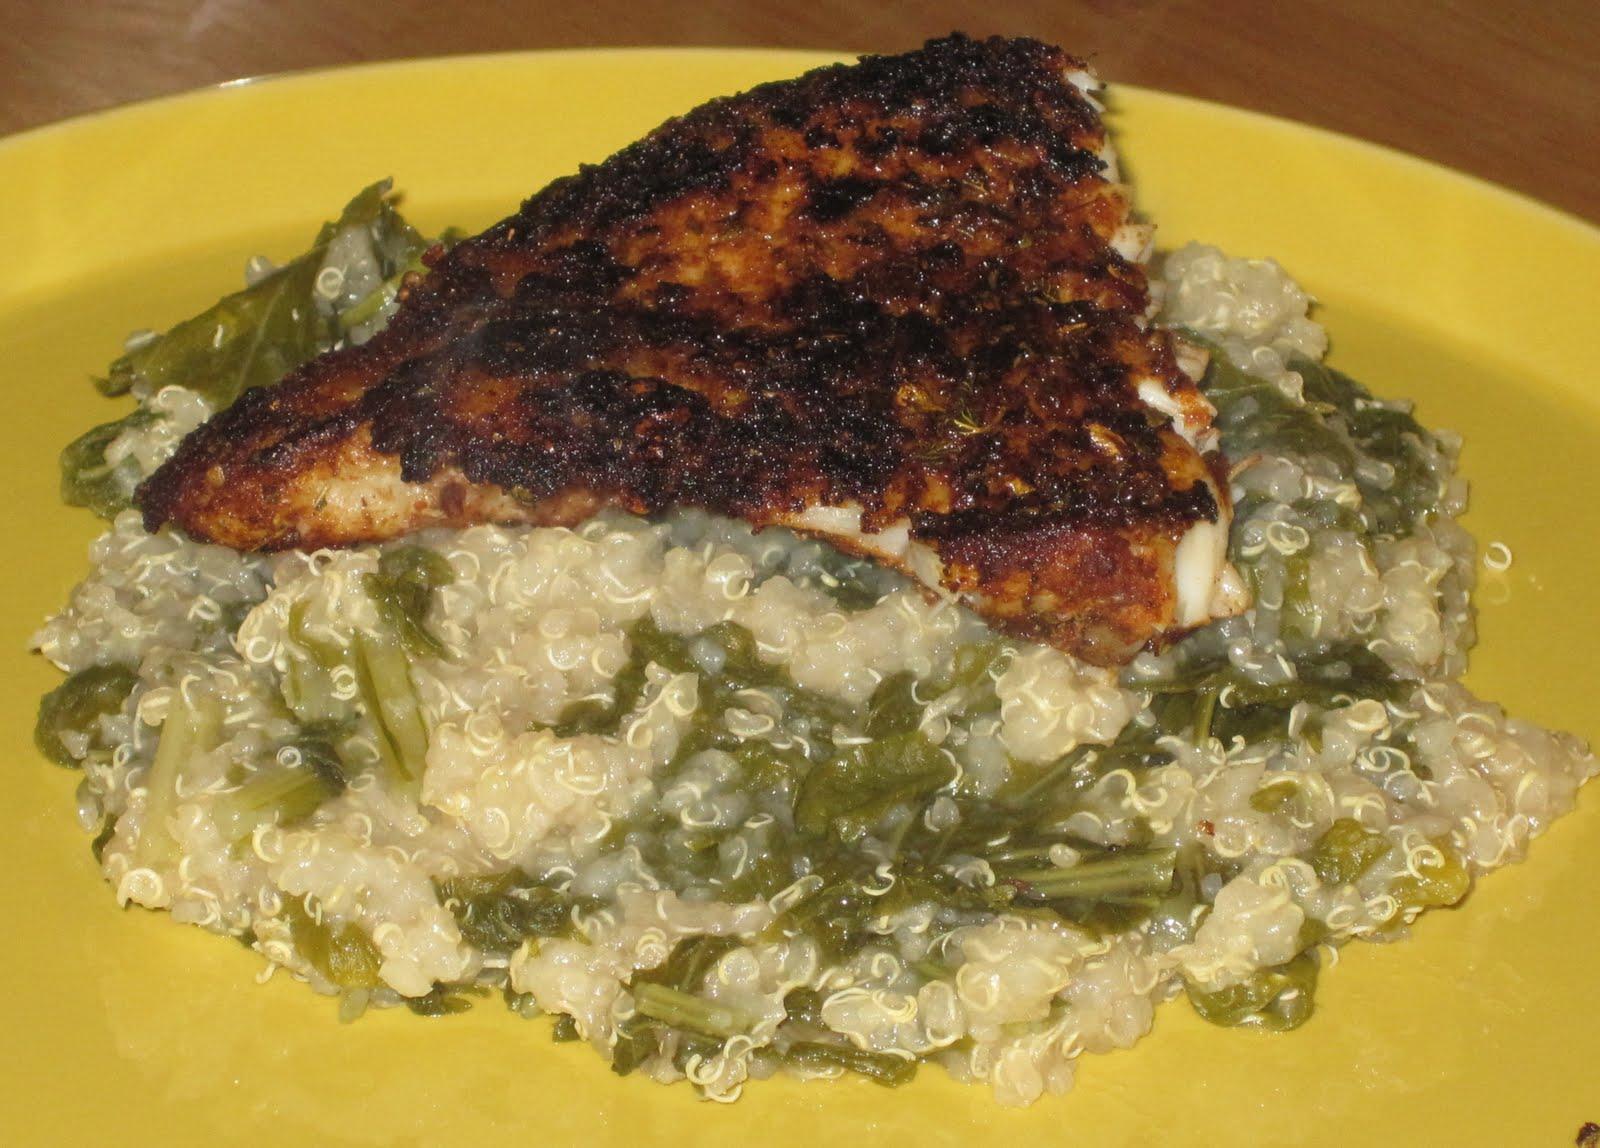 swordfish recipes blackened - tonsils are blackened || blue blackened ...